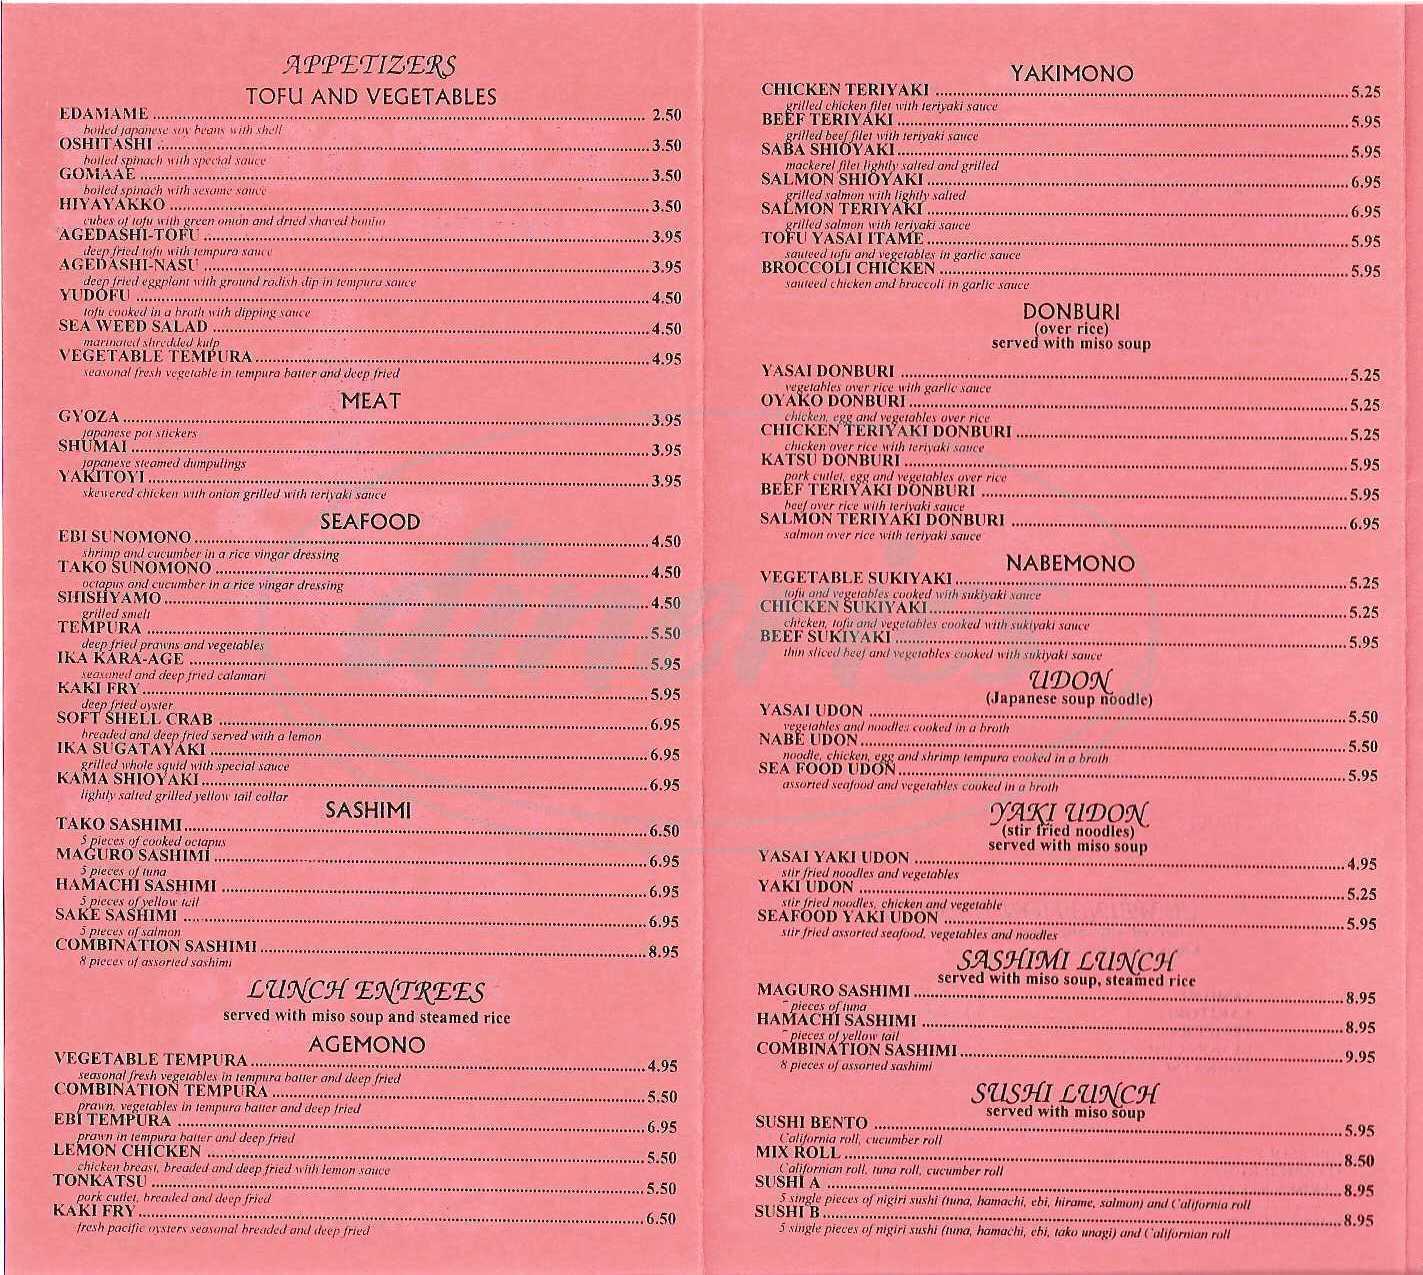 menu for Kotobuki